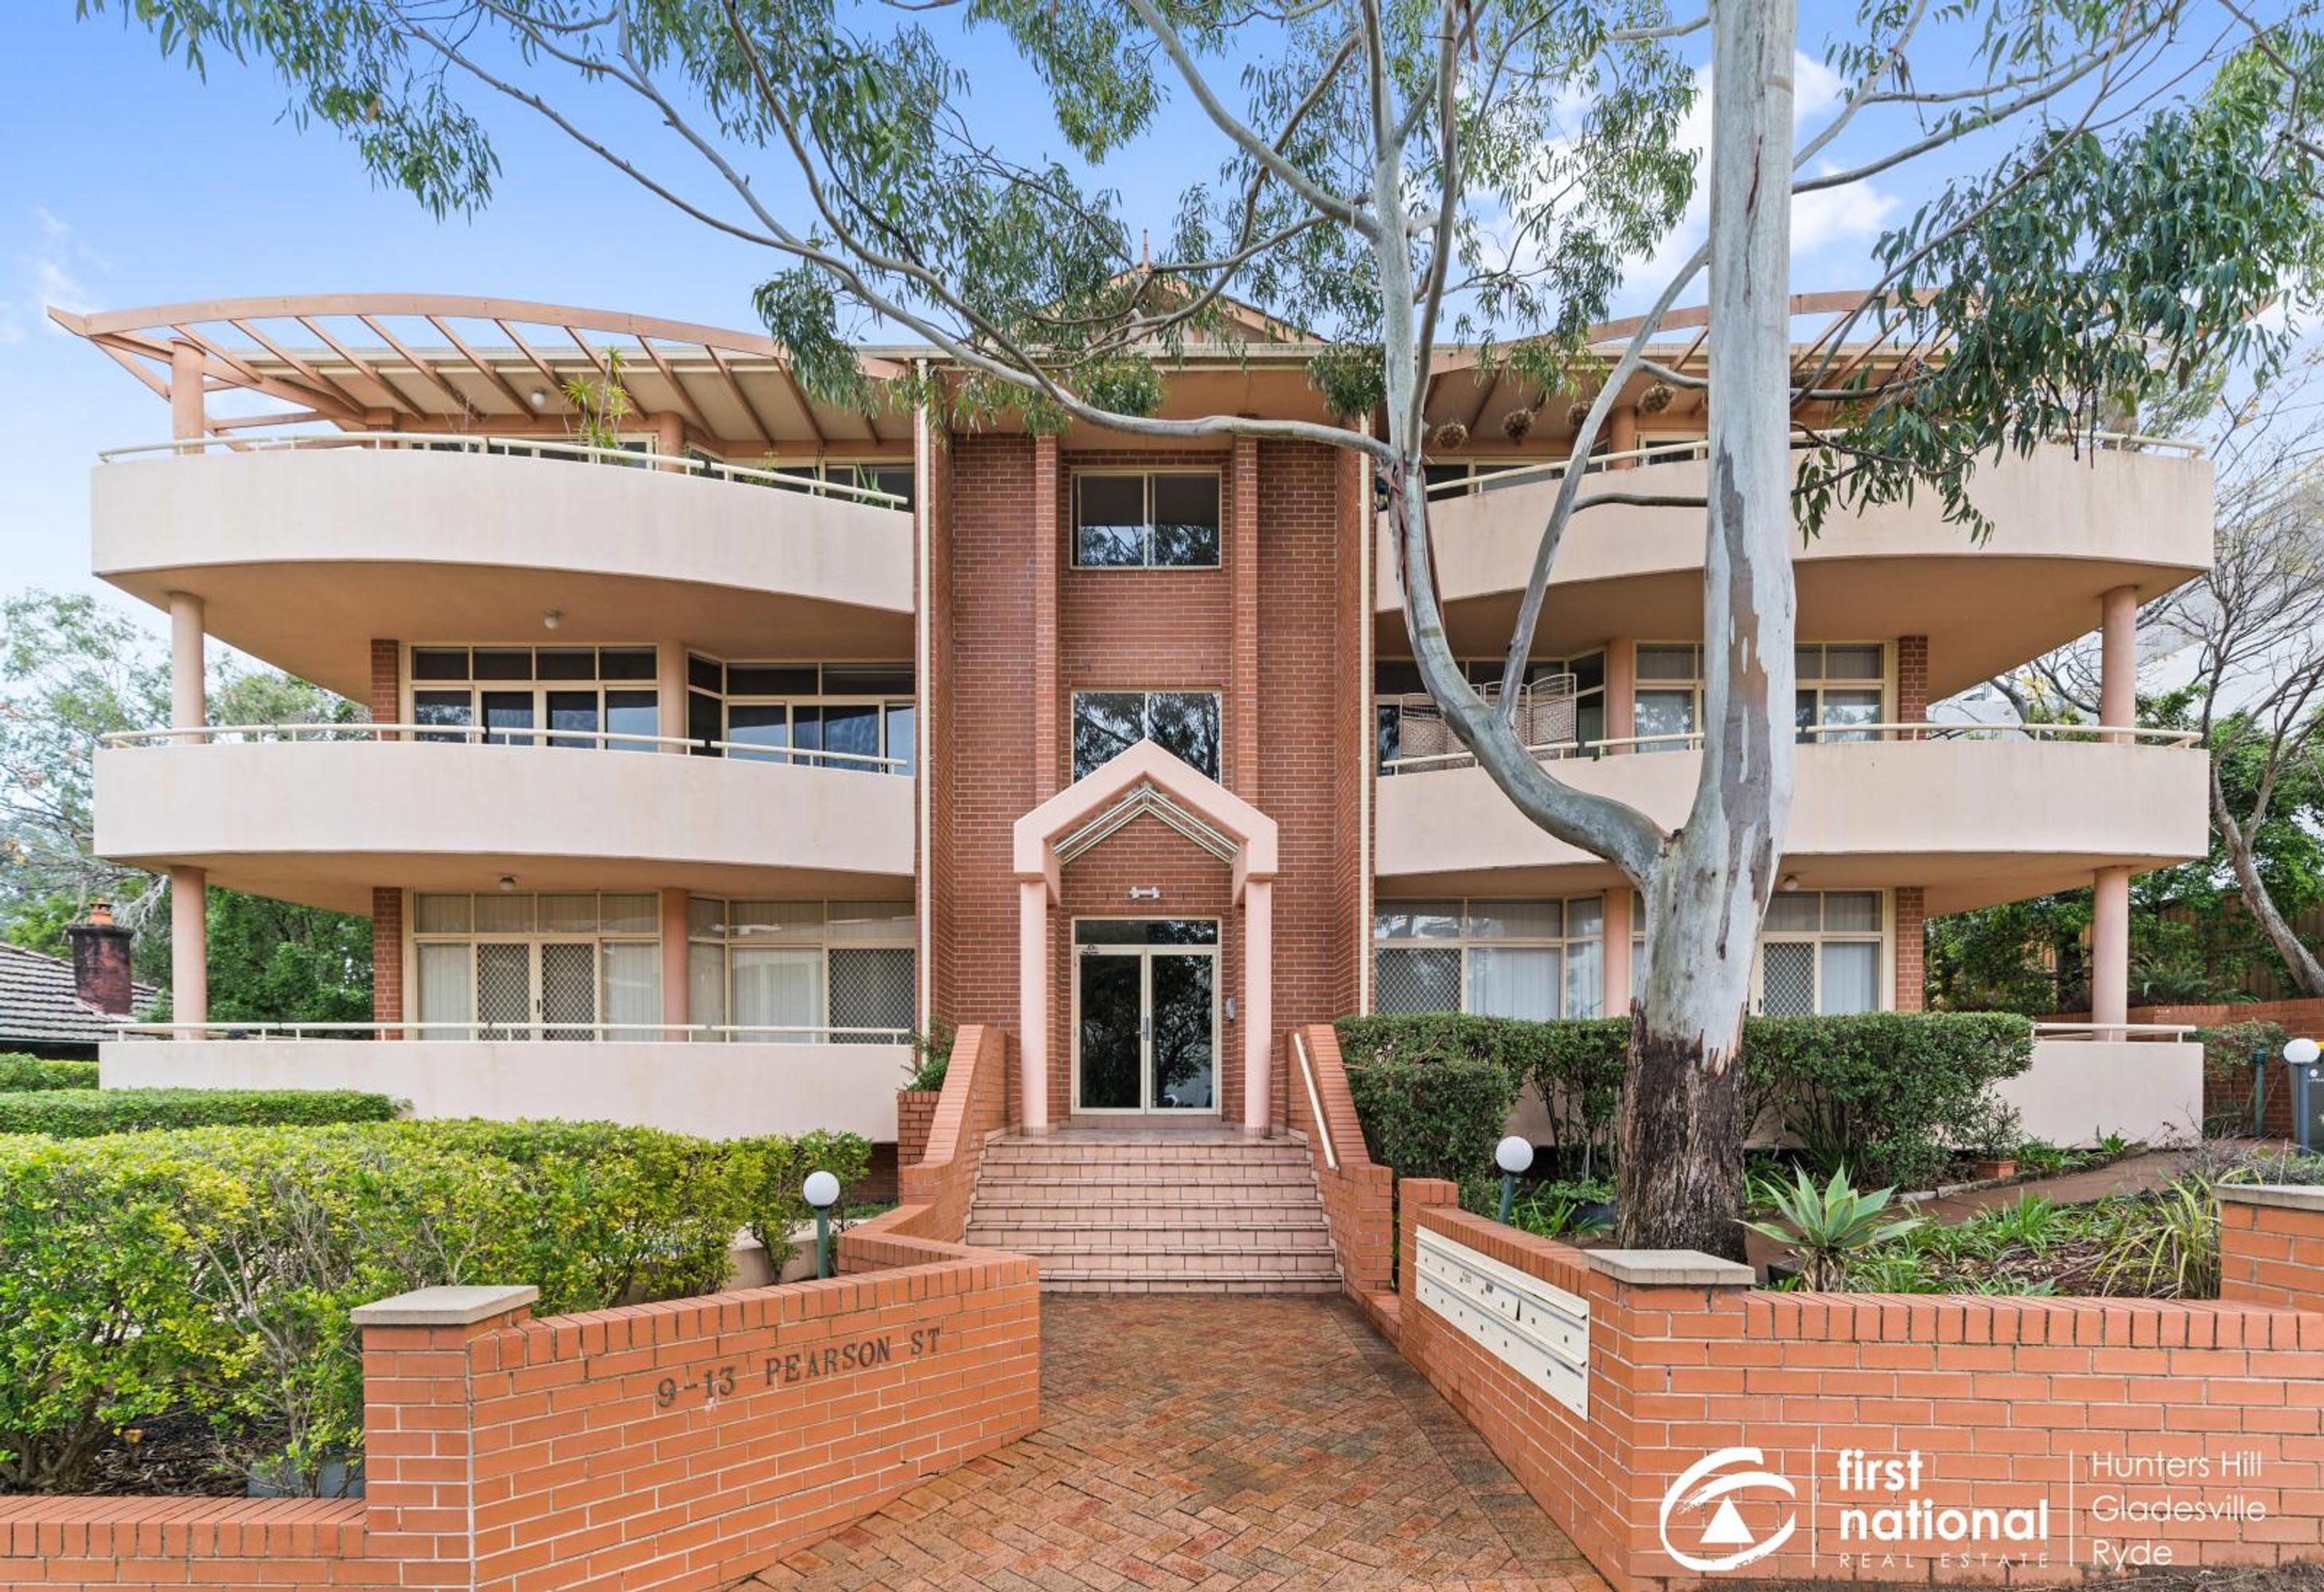 7/9-13 Pearson Street, Gladesville, NSW 2111